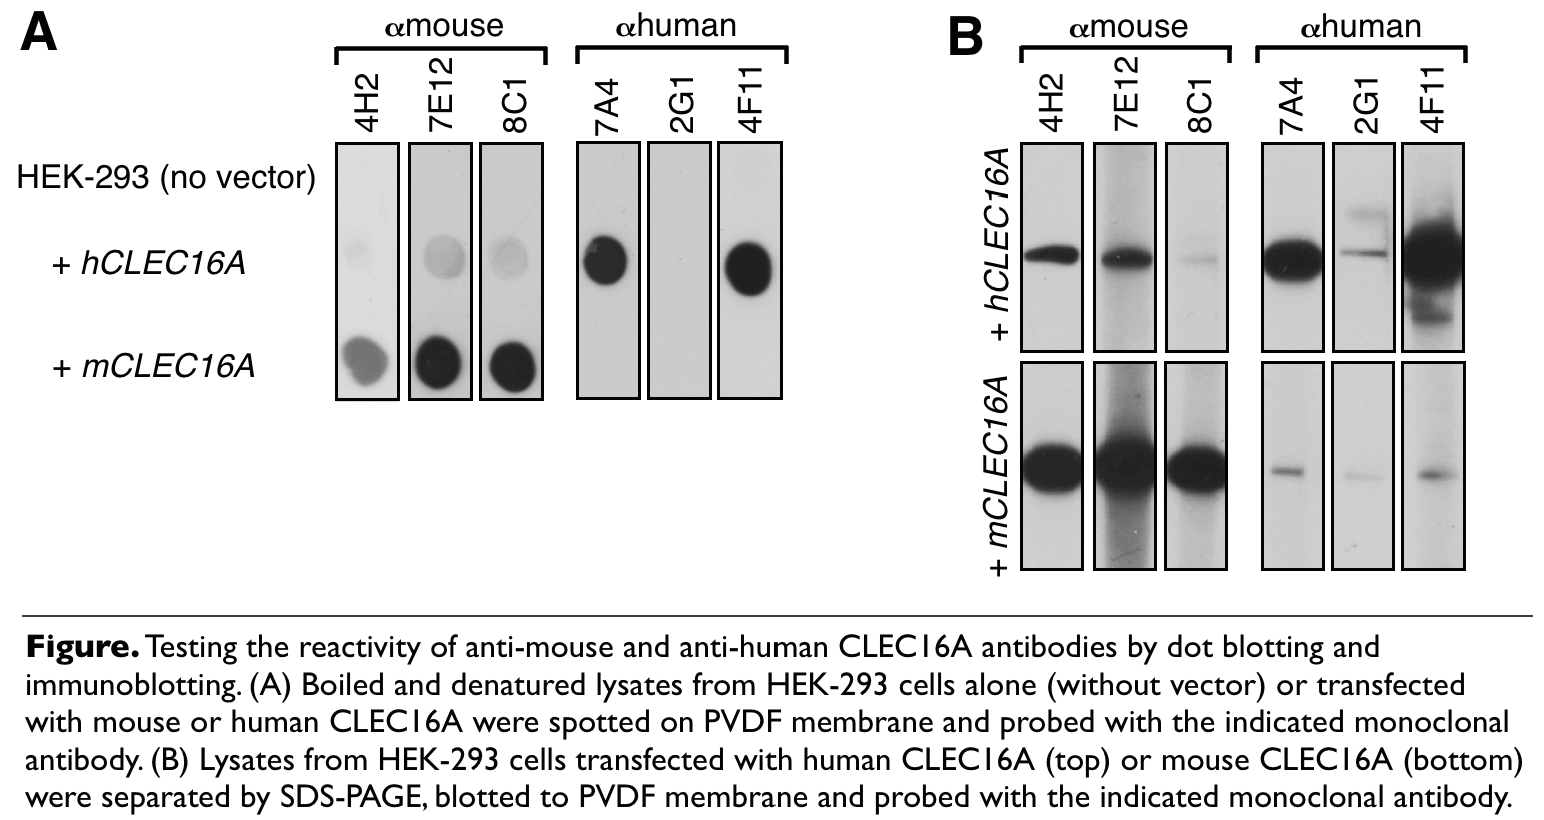 Image thumbnail for Anti-CLEC16A [4F11] monoclonal antibody